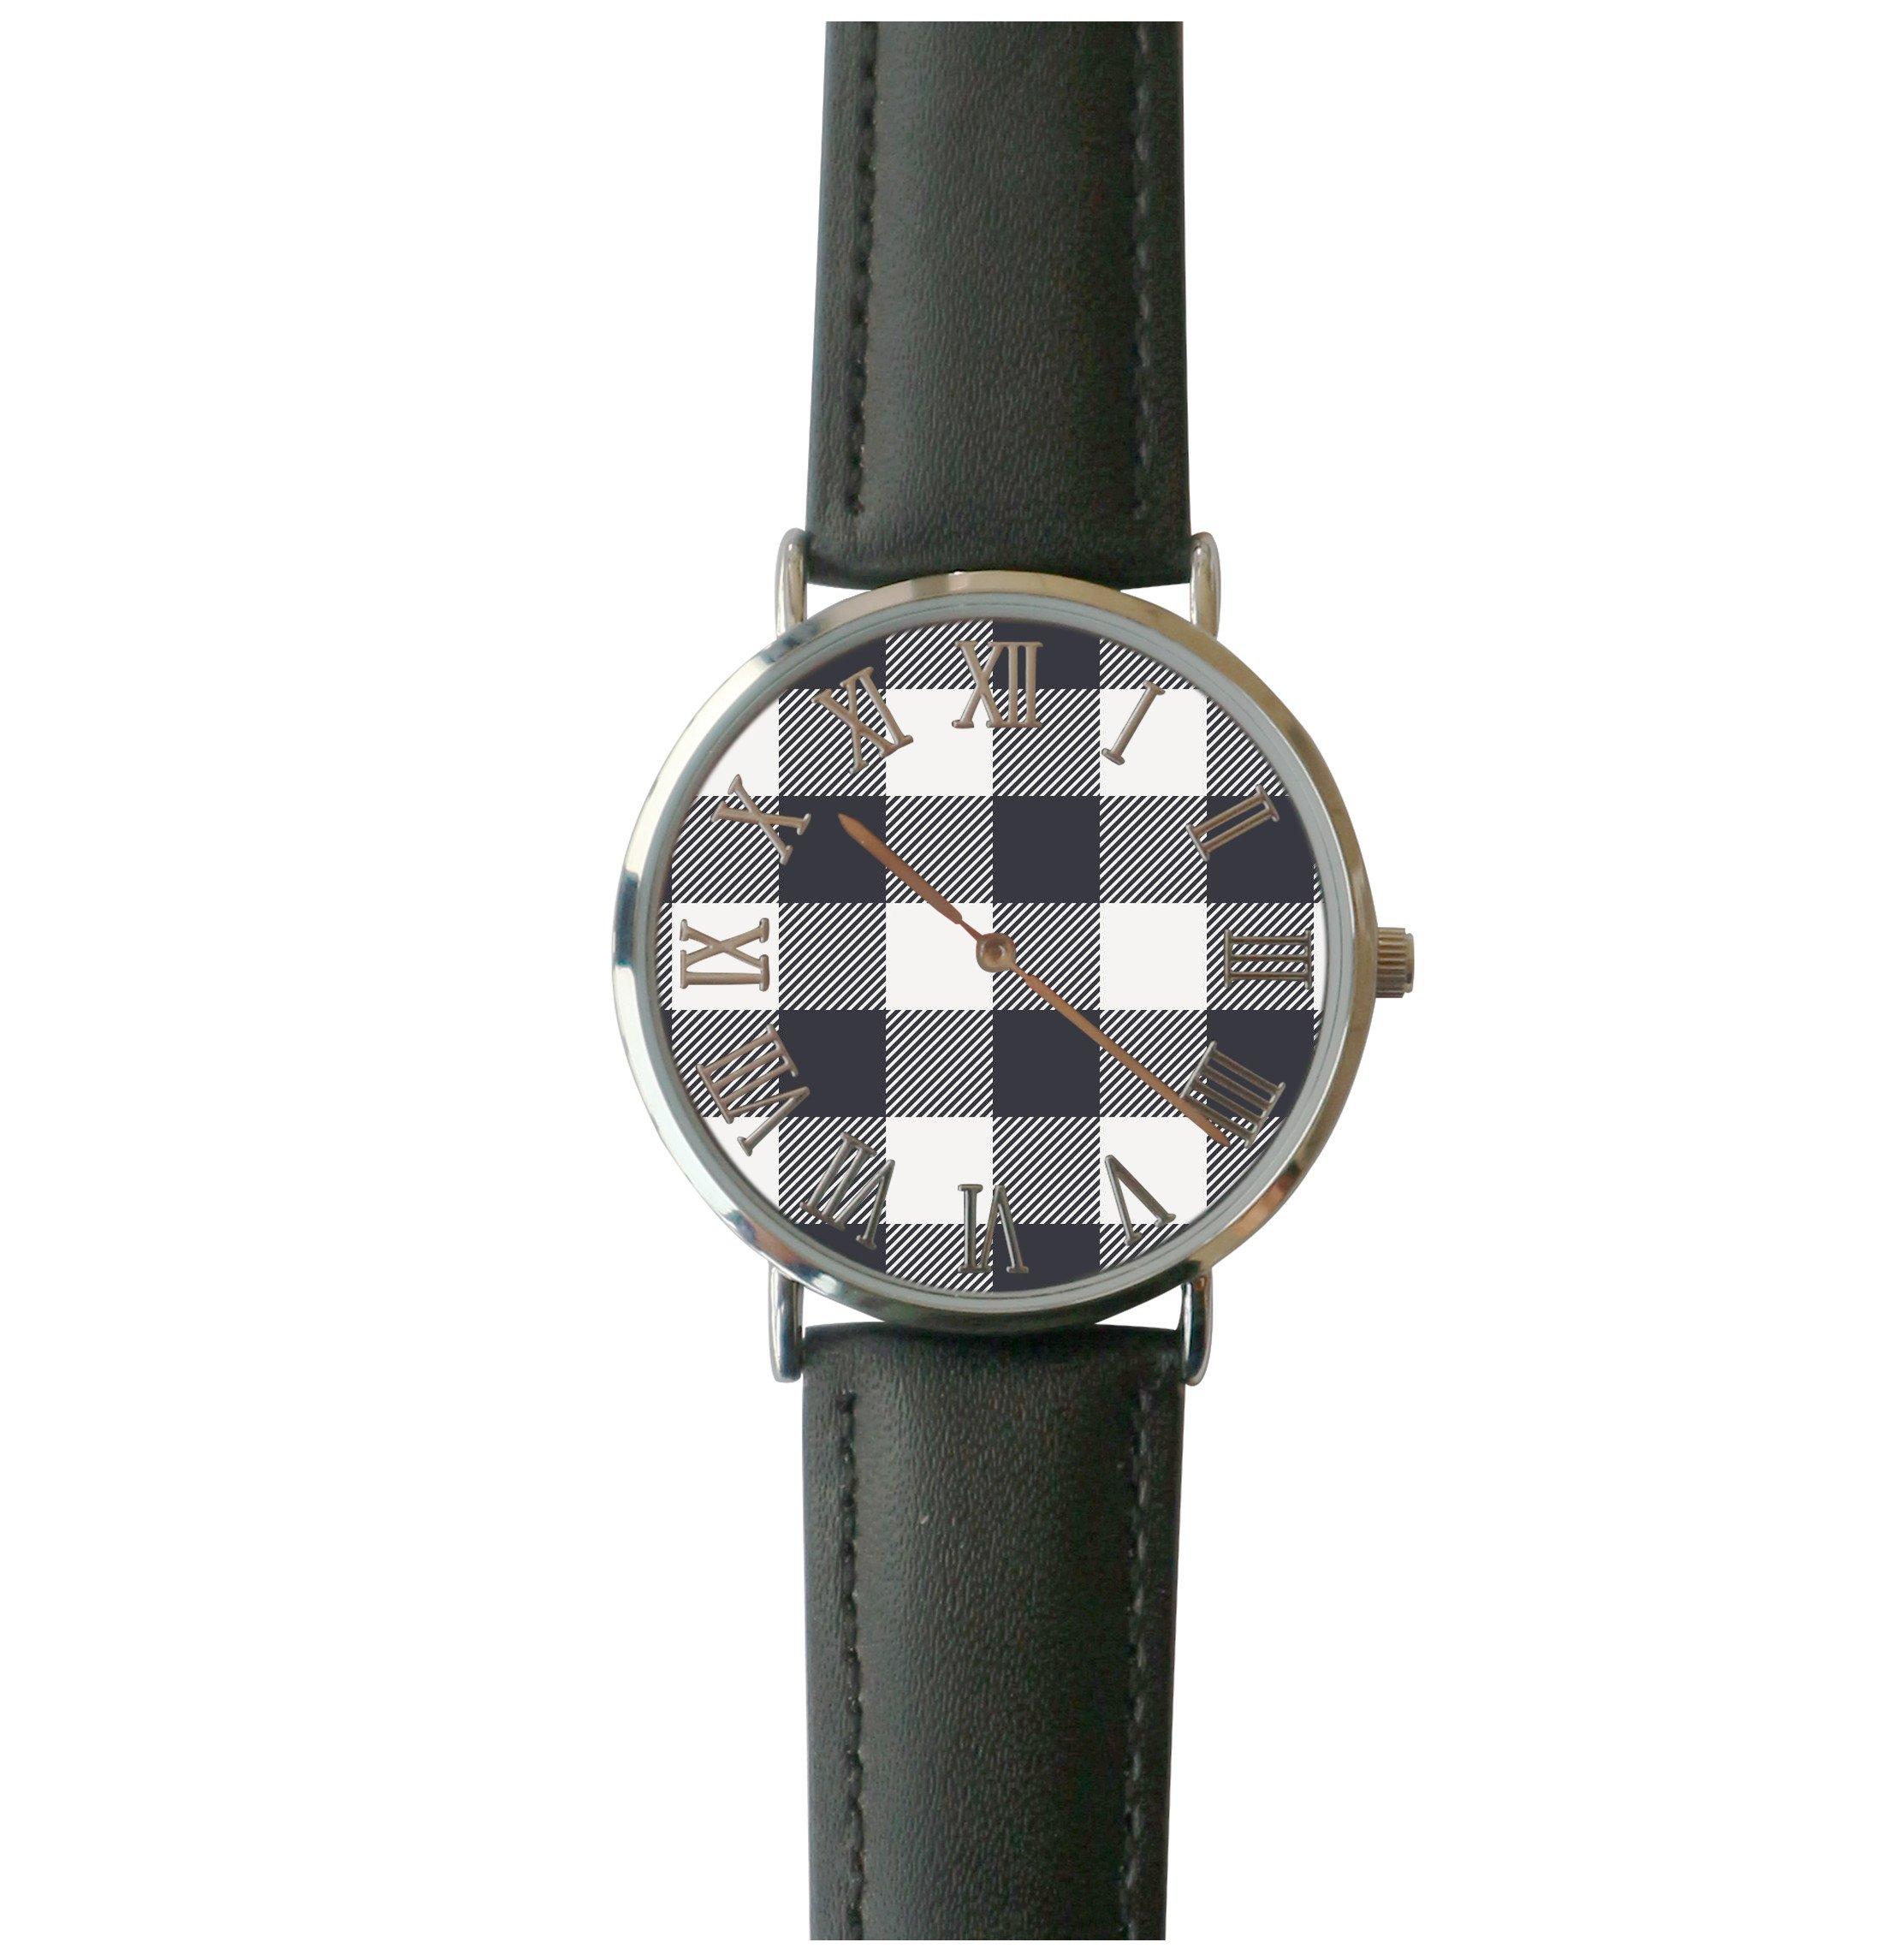 JISJJCKJSX Gray Plaid custom watches quartz watch stainless steel case by JISJJCKJSX (Image #1)